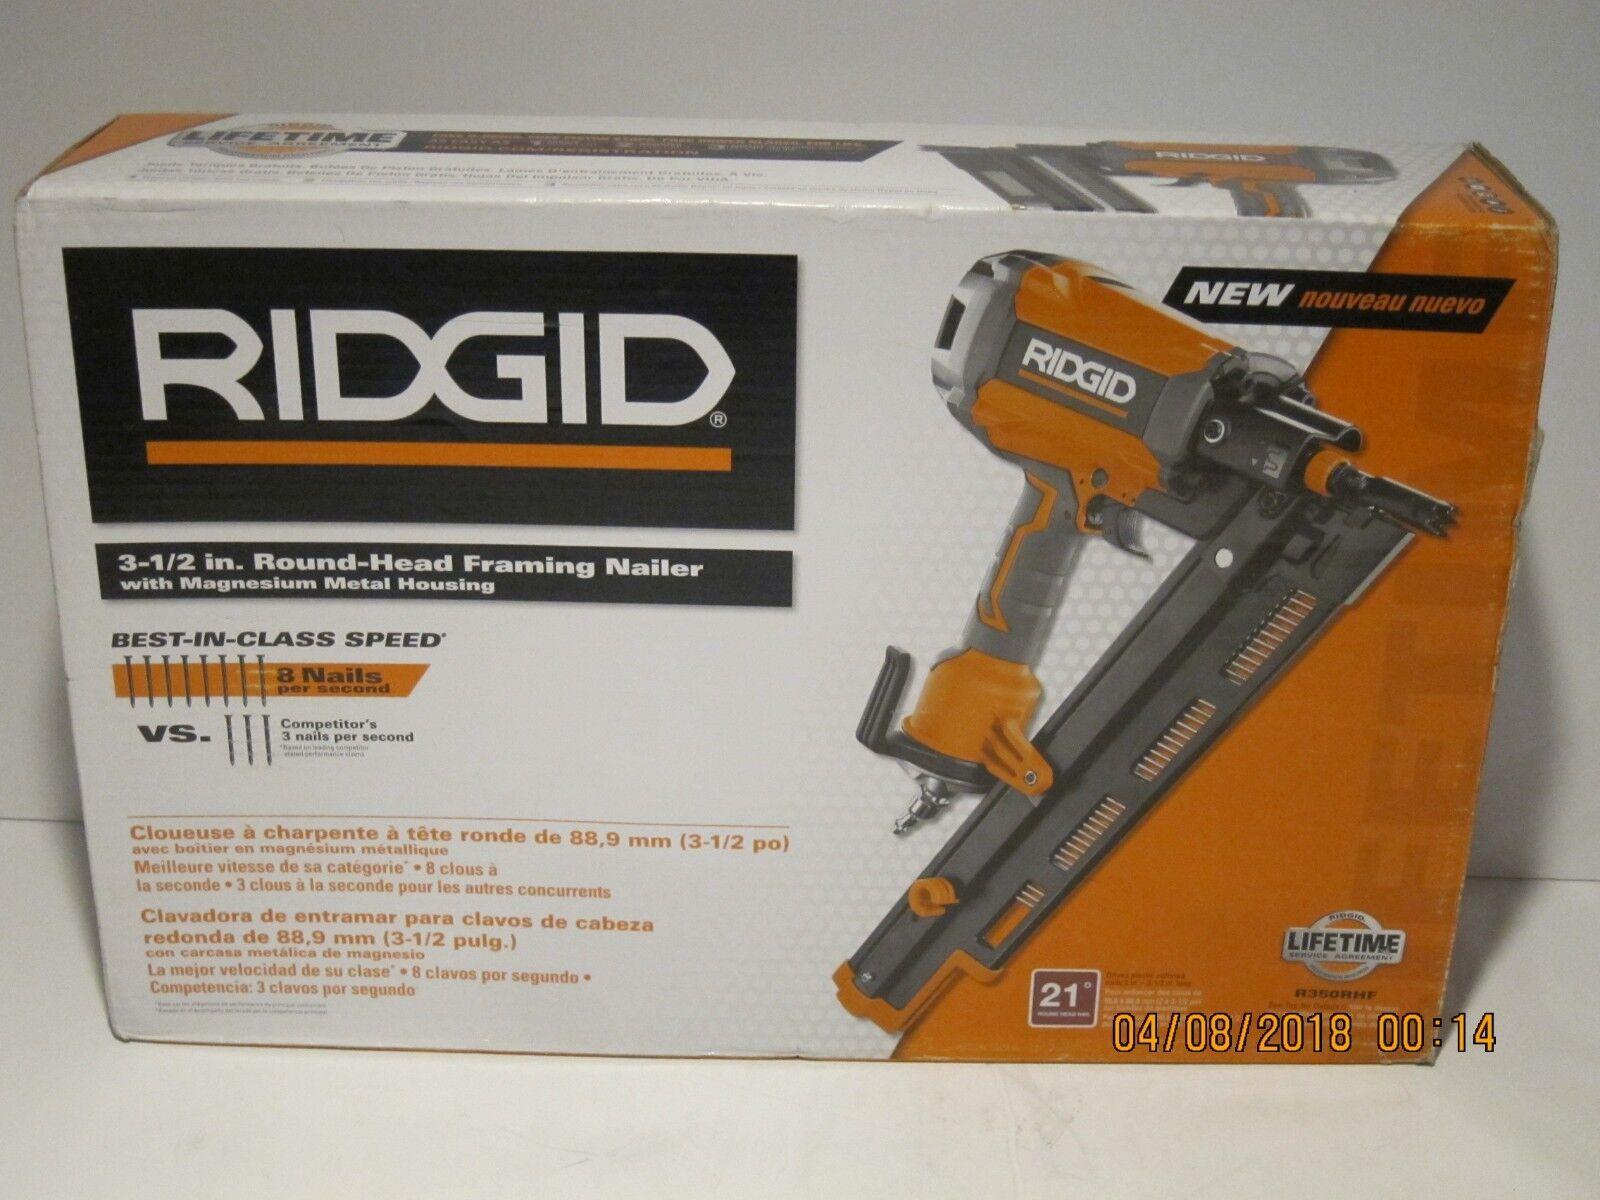 RIDGID R350RHF 21 Degree 3-1 2  Round-Head Framing Nailer-F SHIP NEW SEALED BOX